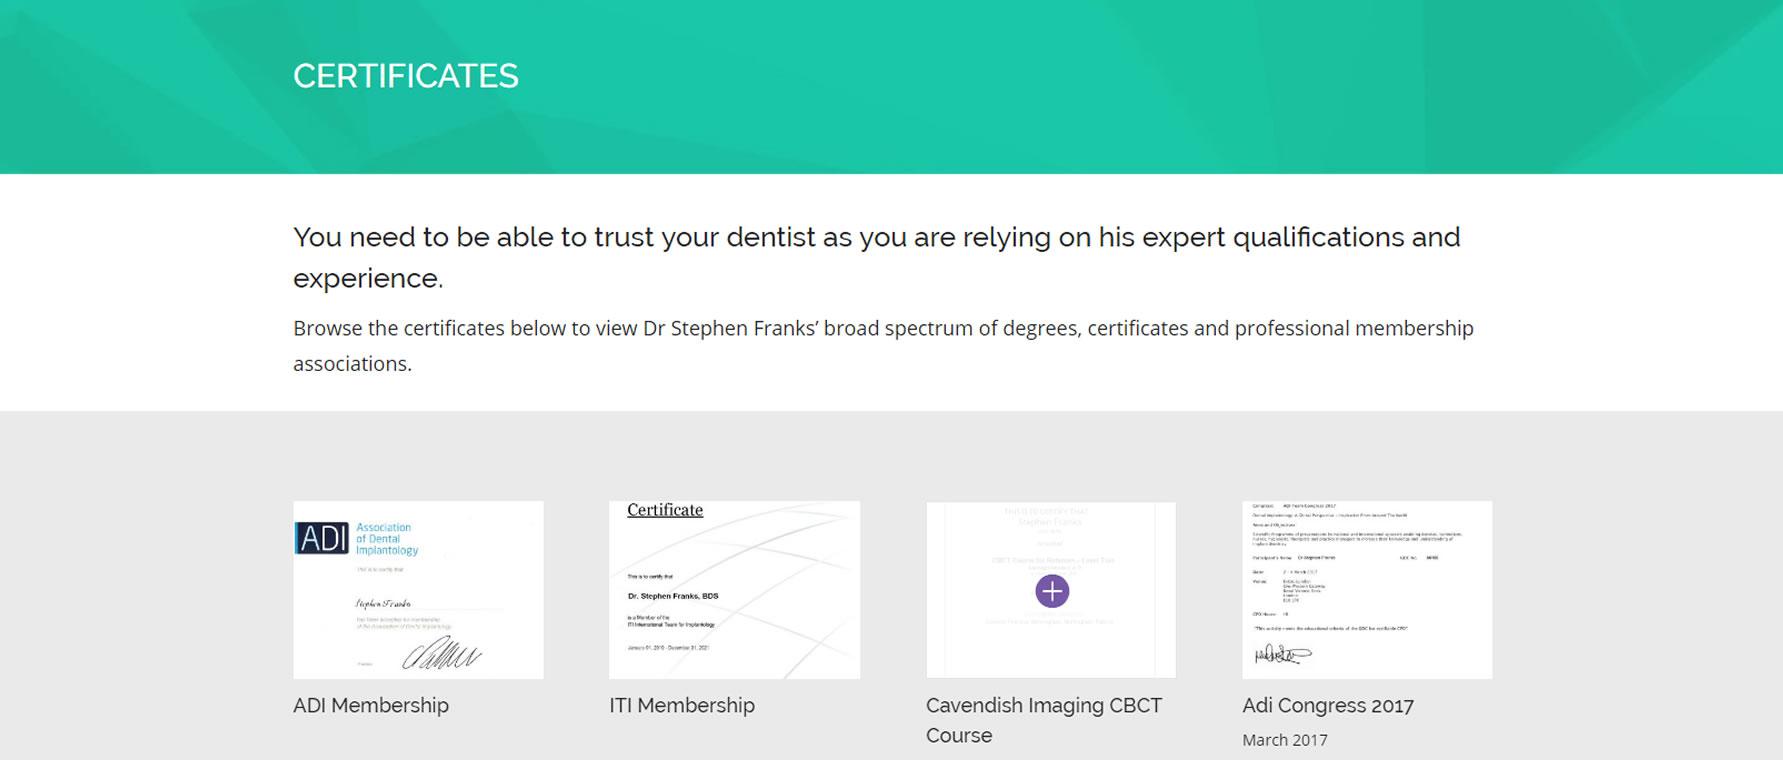 franks-dental-certificates